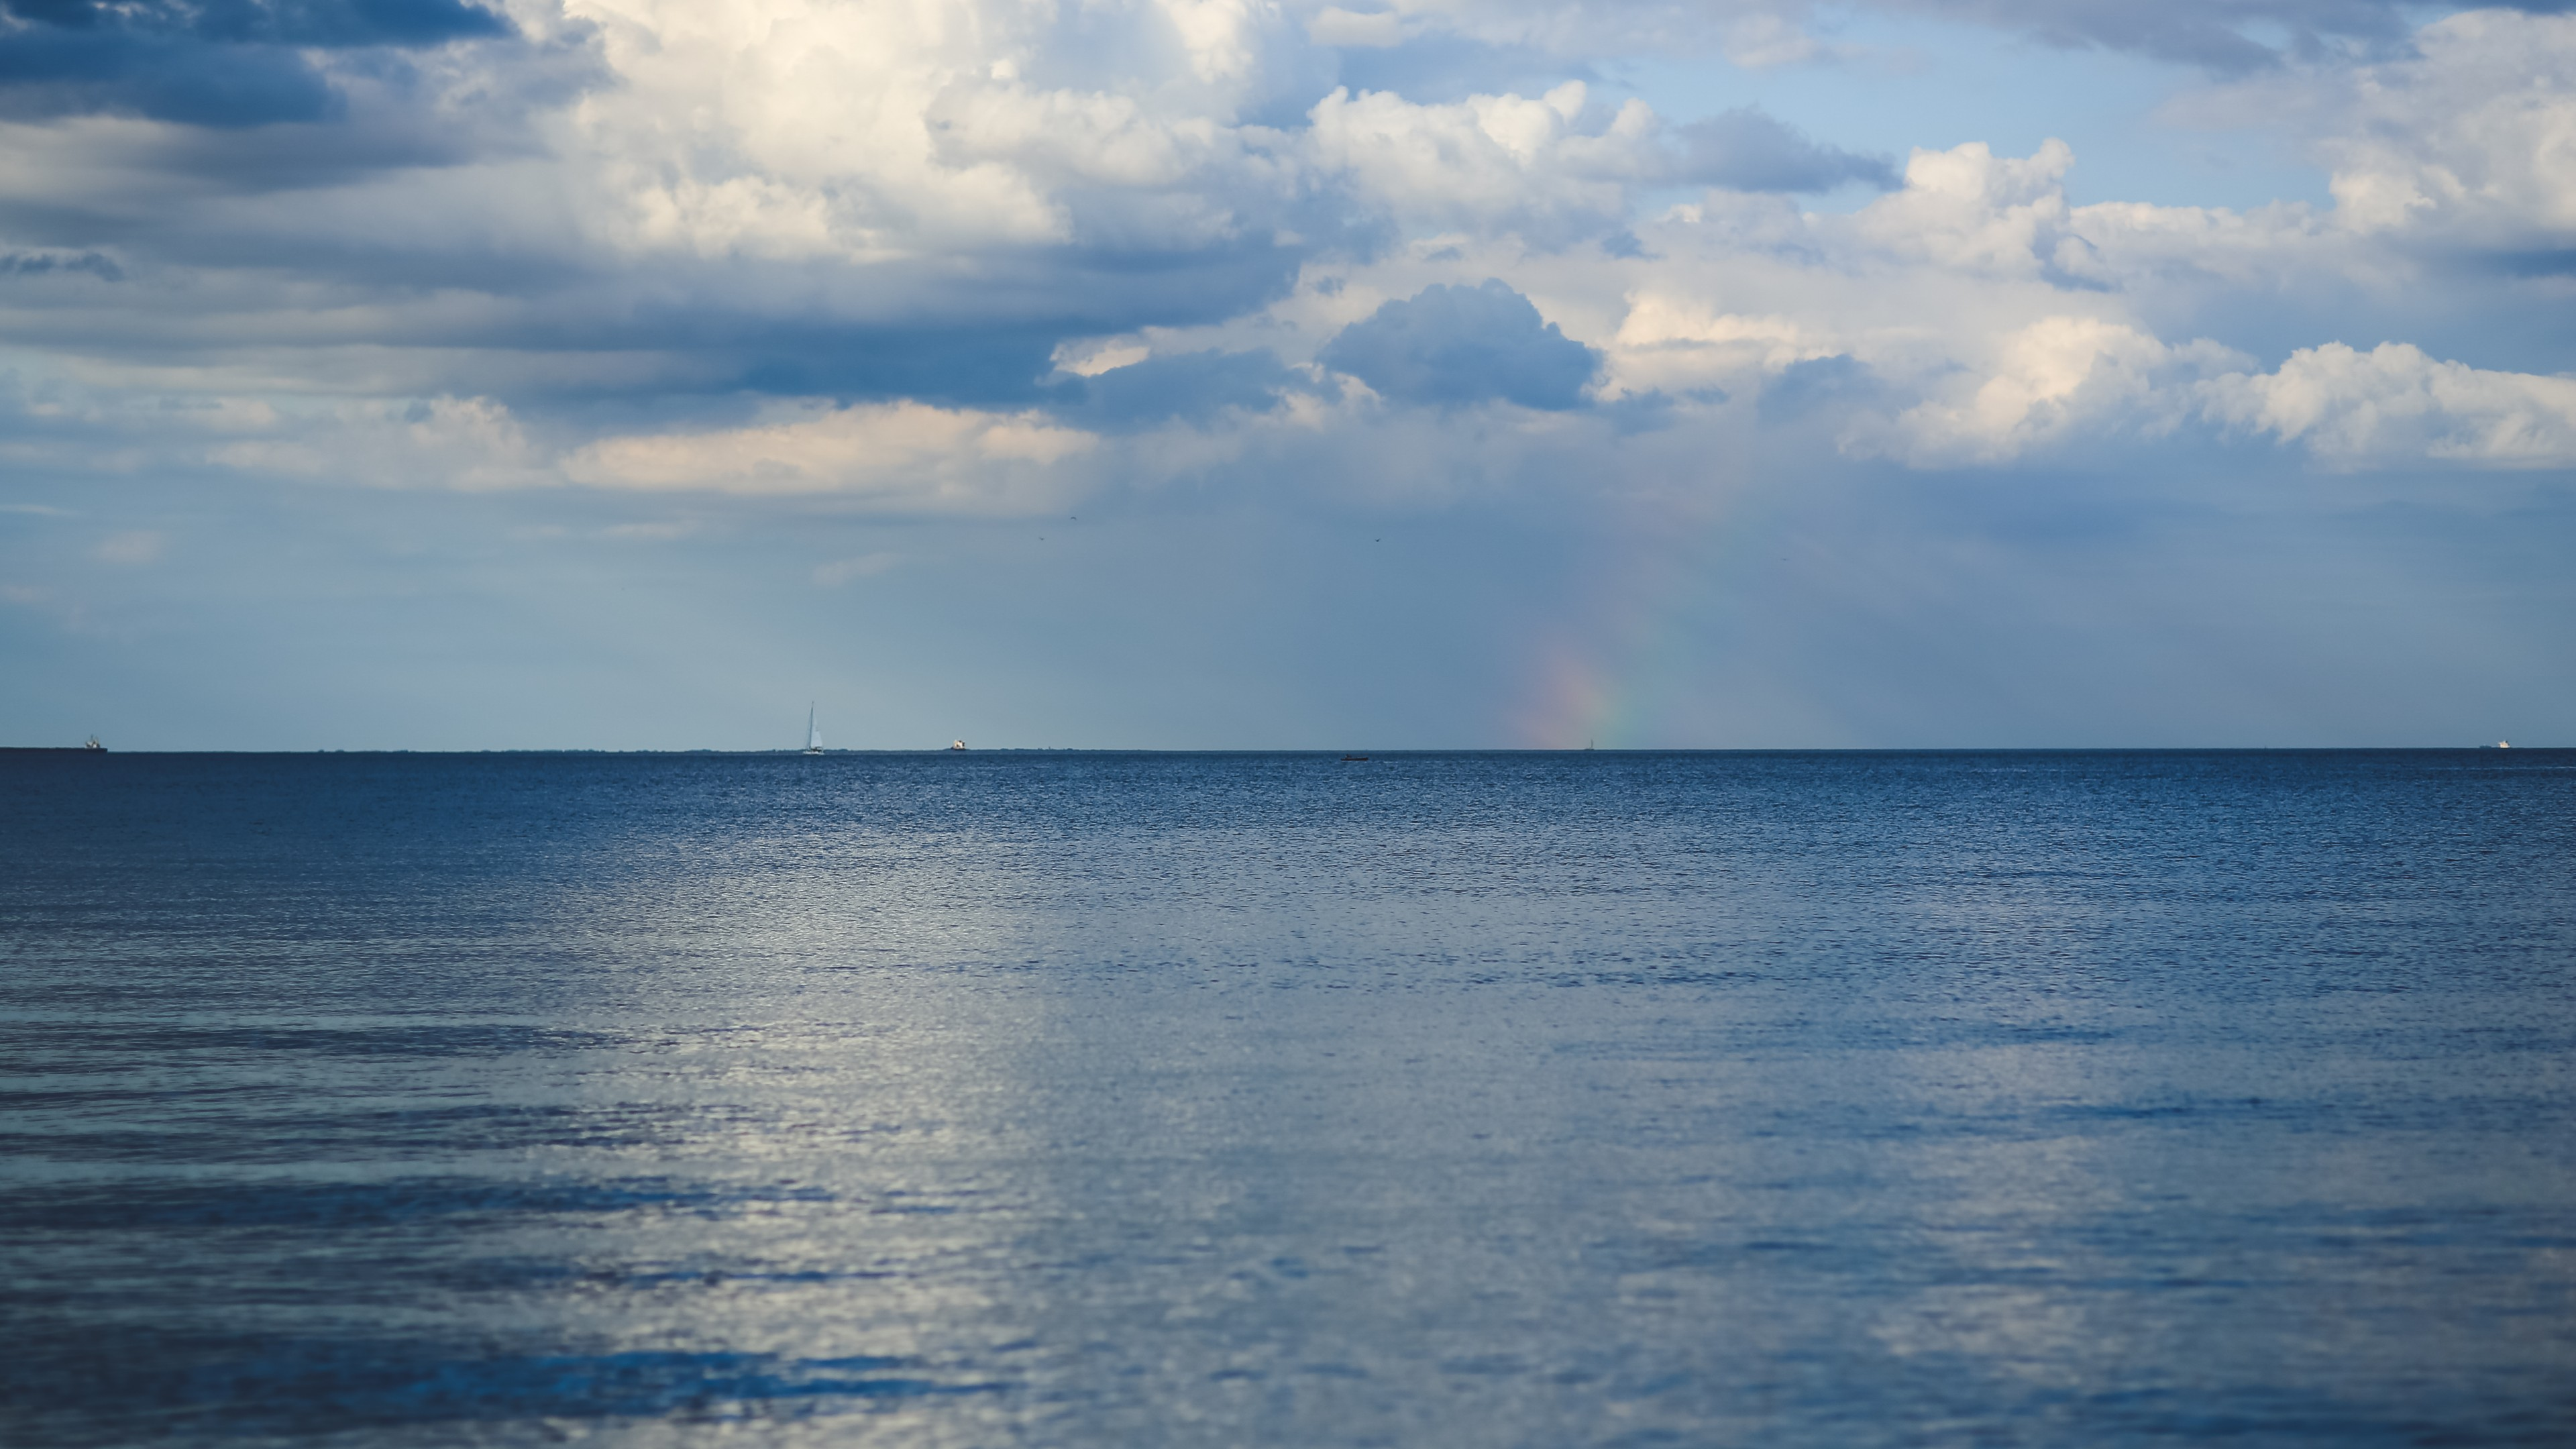 Ảnh background bầu trời trên biển